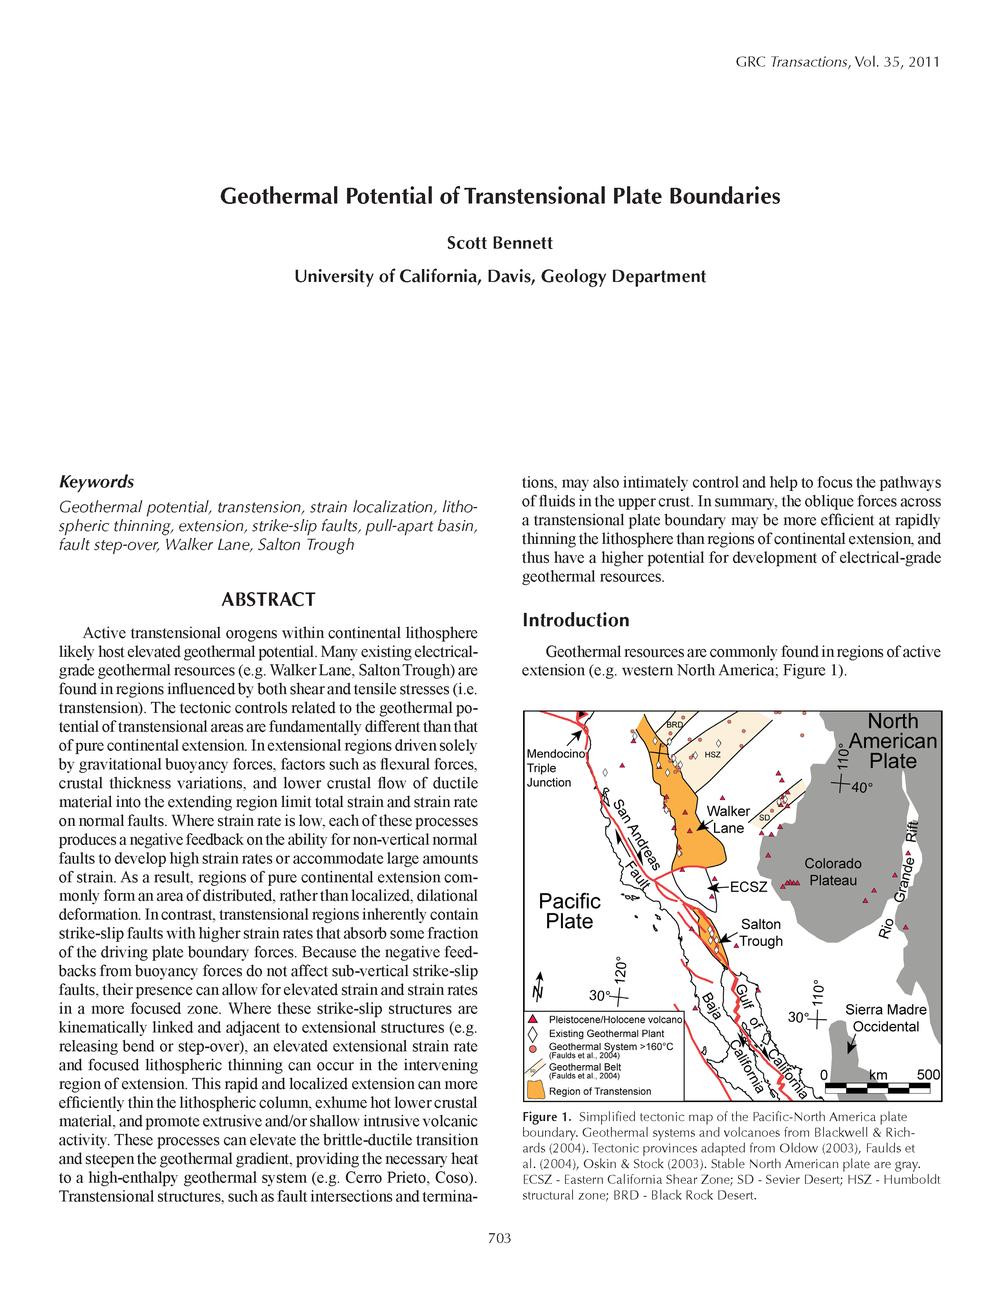 Bennett_Geothermal Potential of Transtensional Plate Boundaries_GRC Trans_2011.png